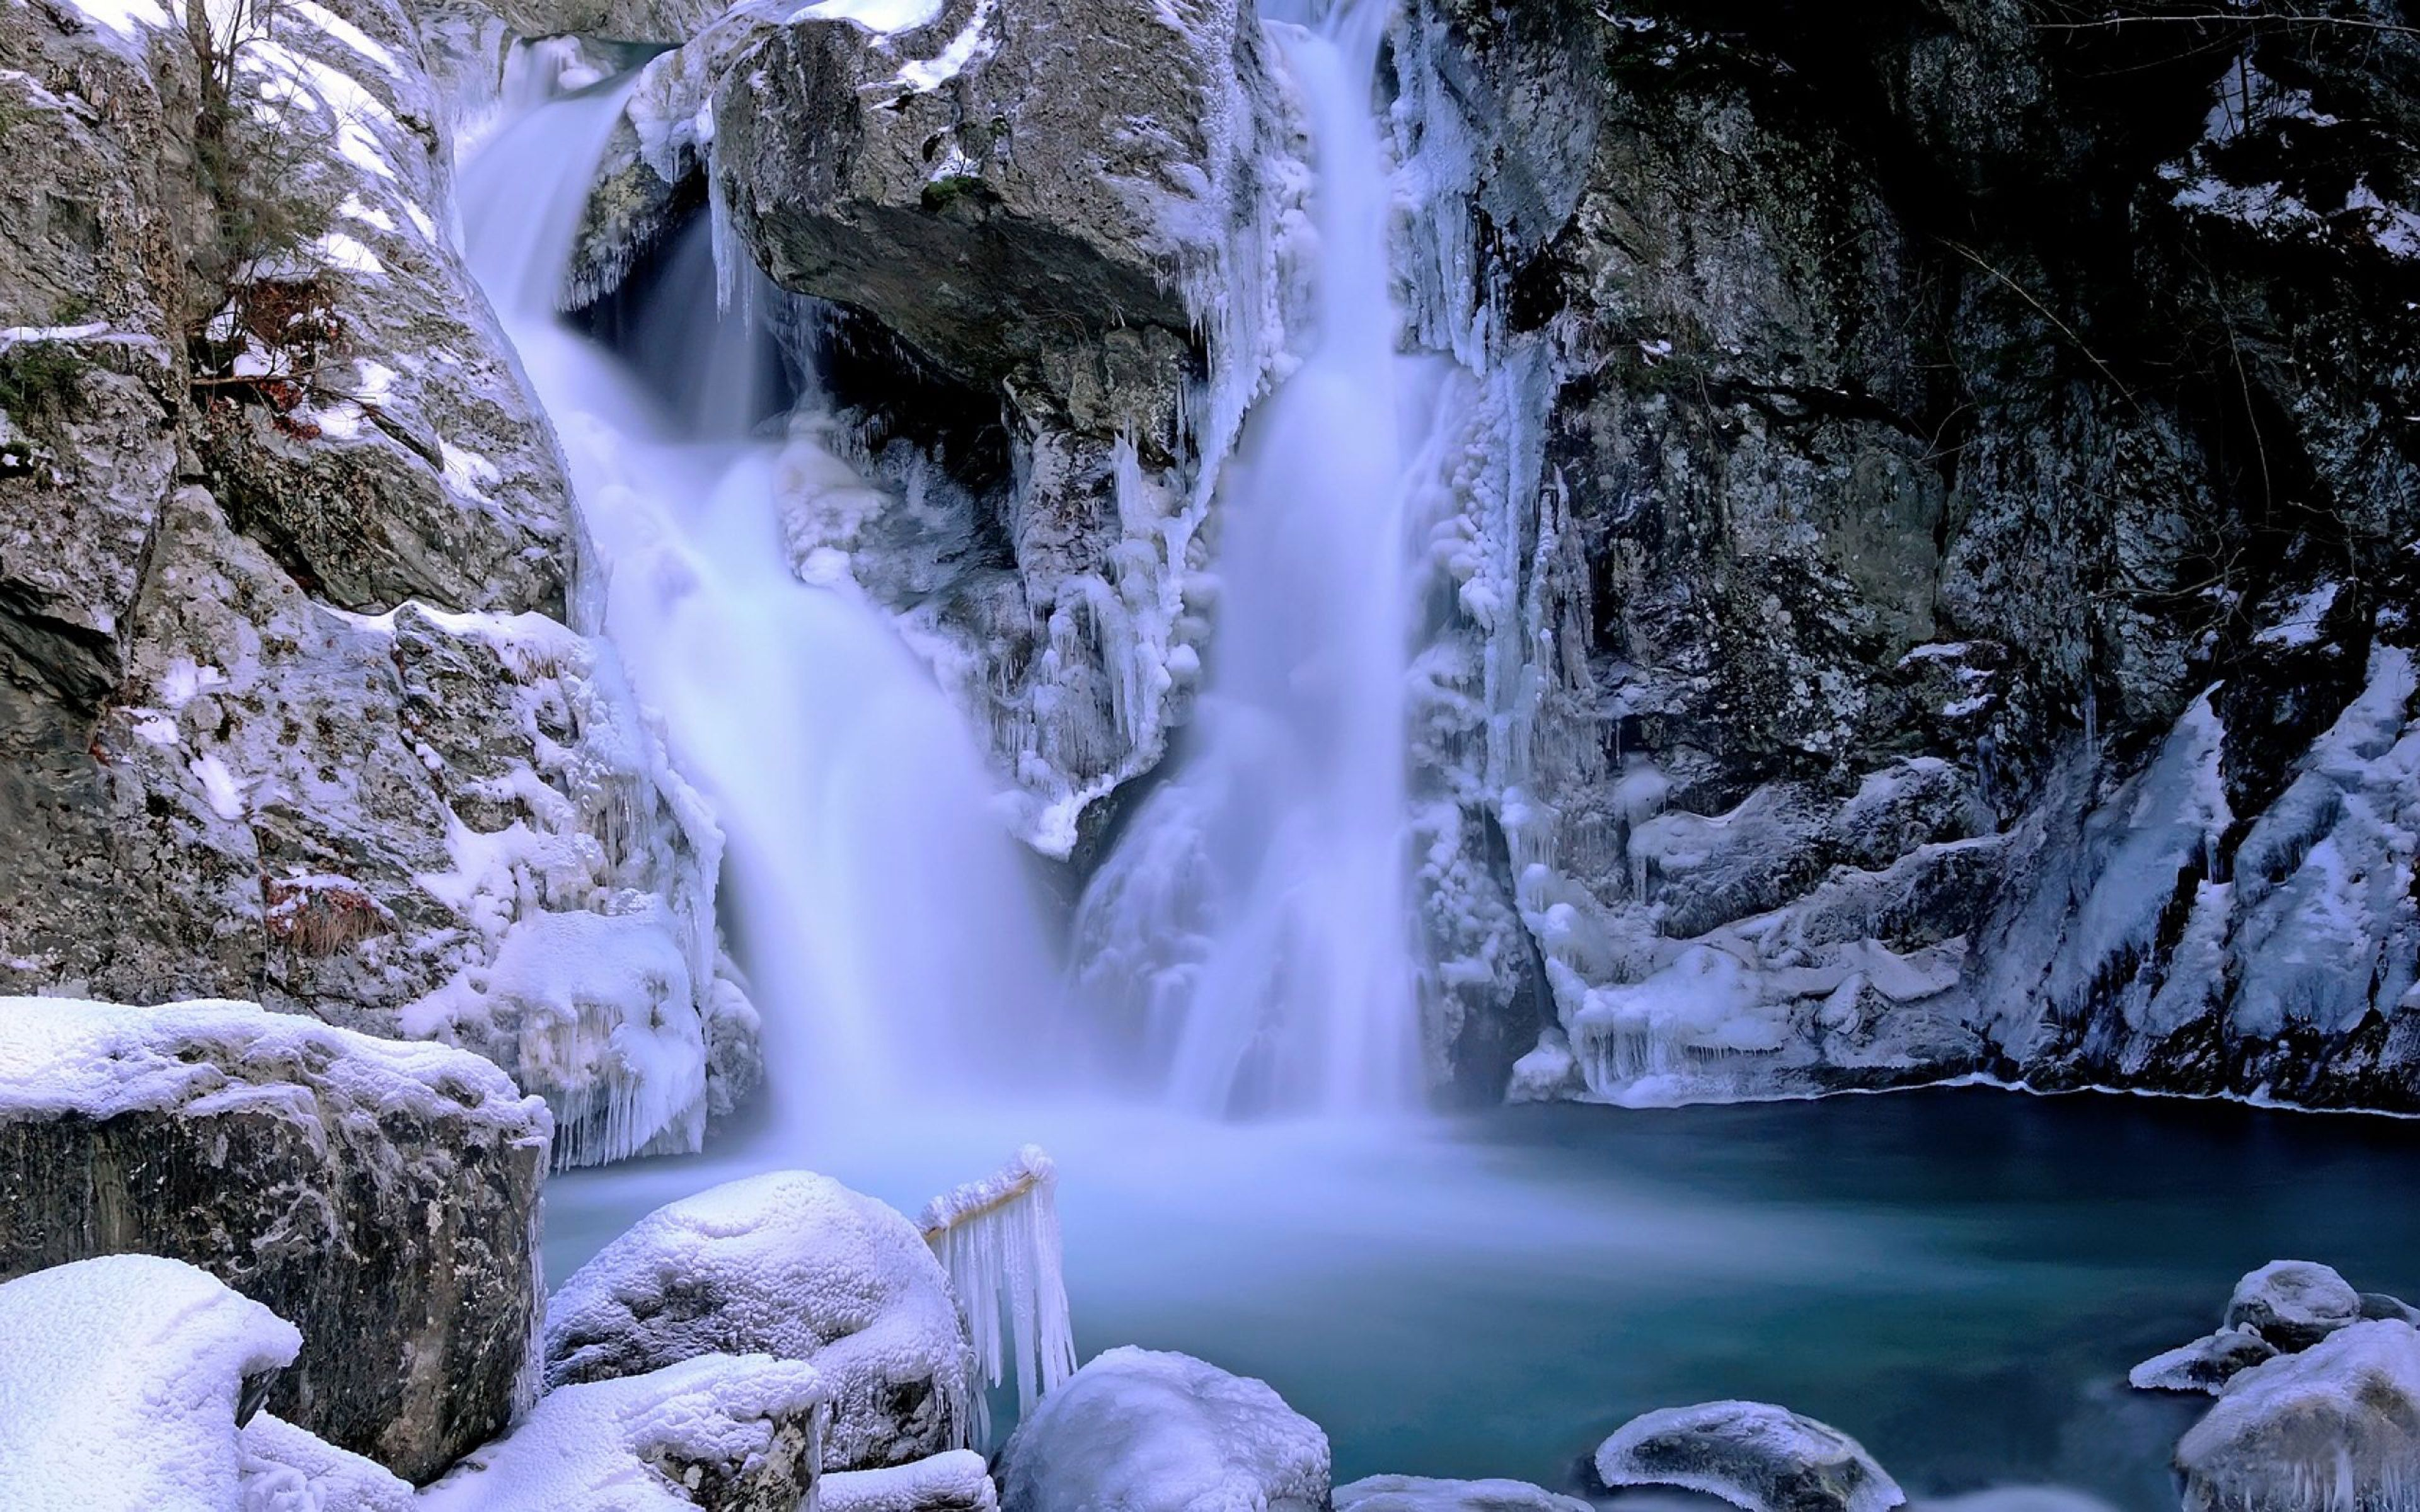 winter nature backgrounds wallpaper | hd wallpapers | pinterest